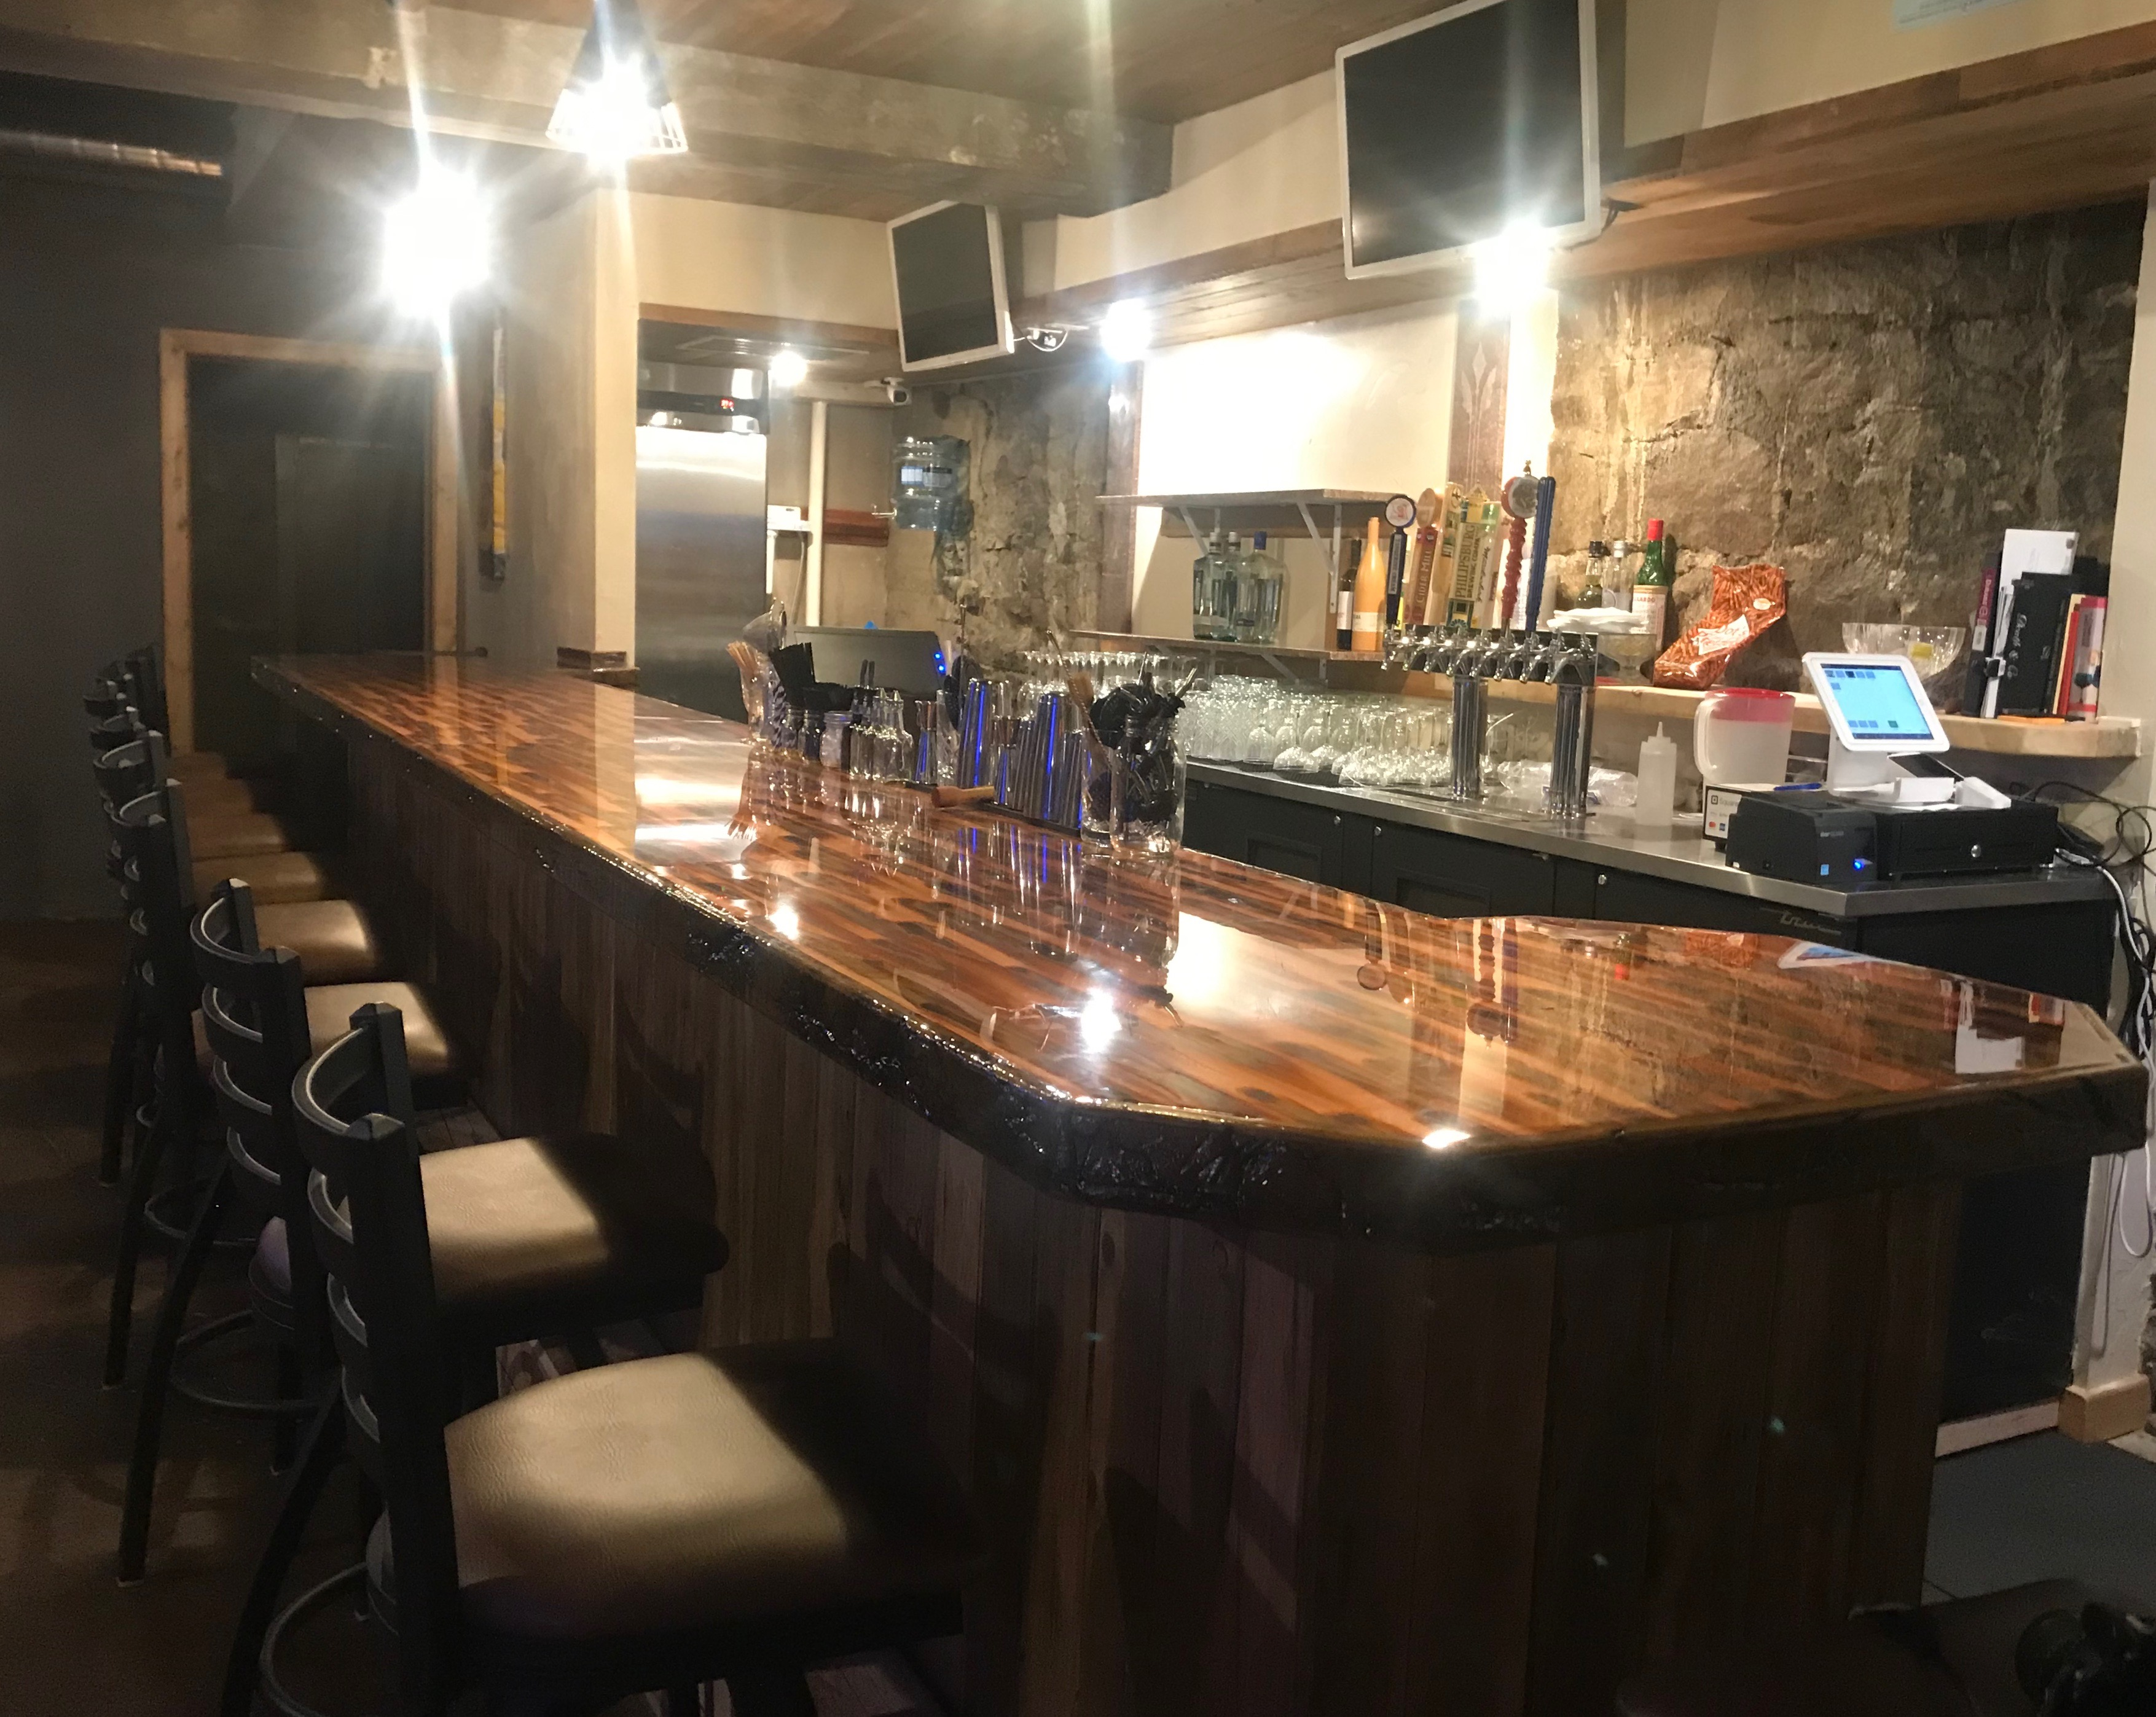 Hotel De La Butte miners hotel butte mt a historic boutique hotel in uptown